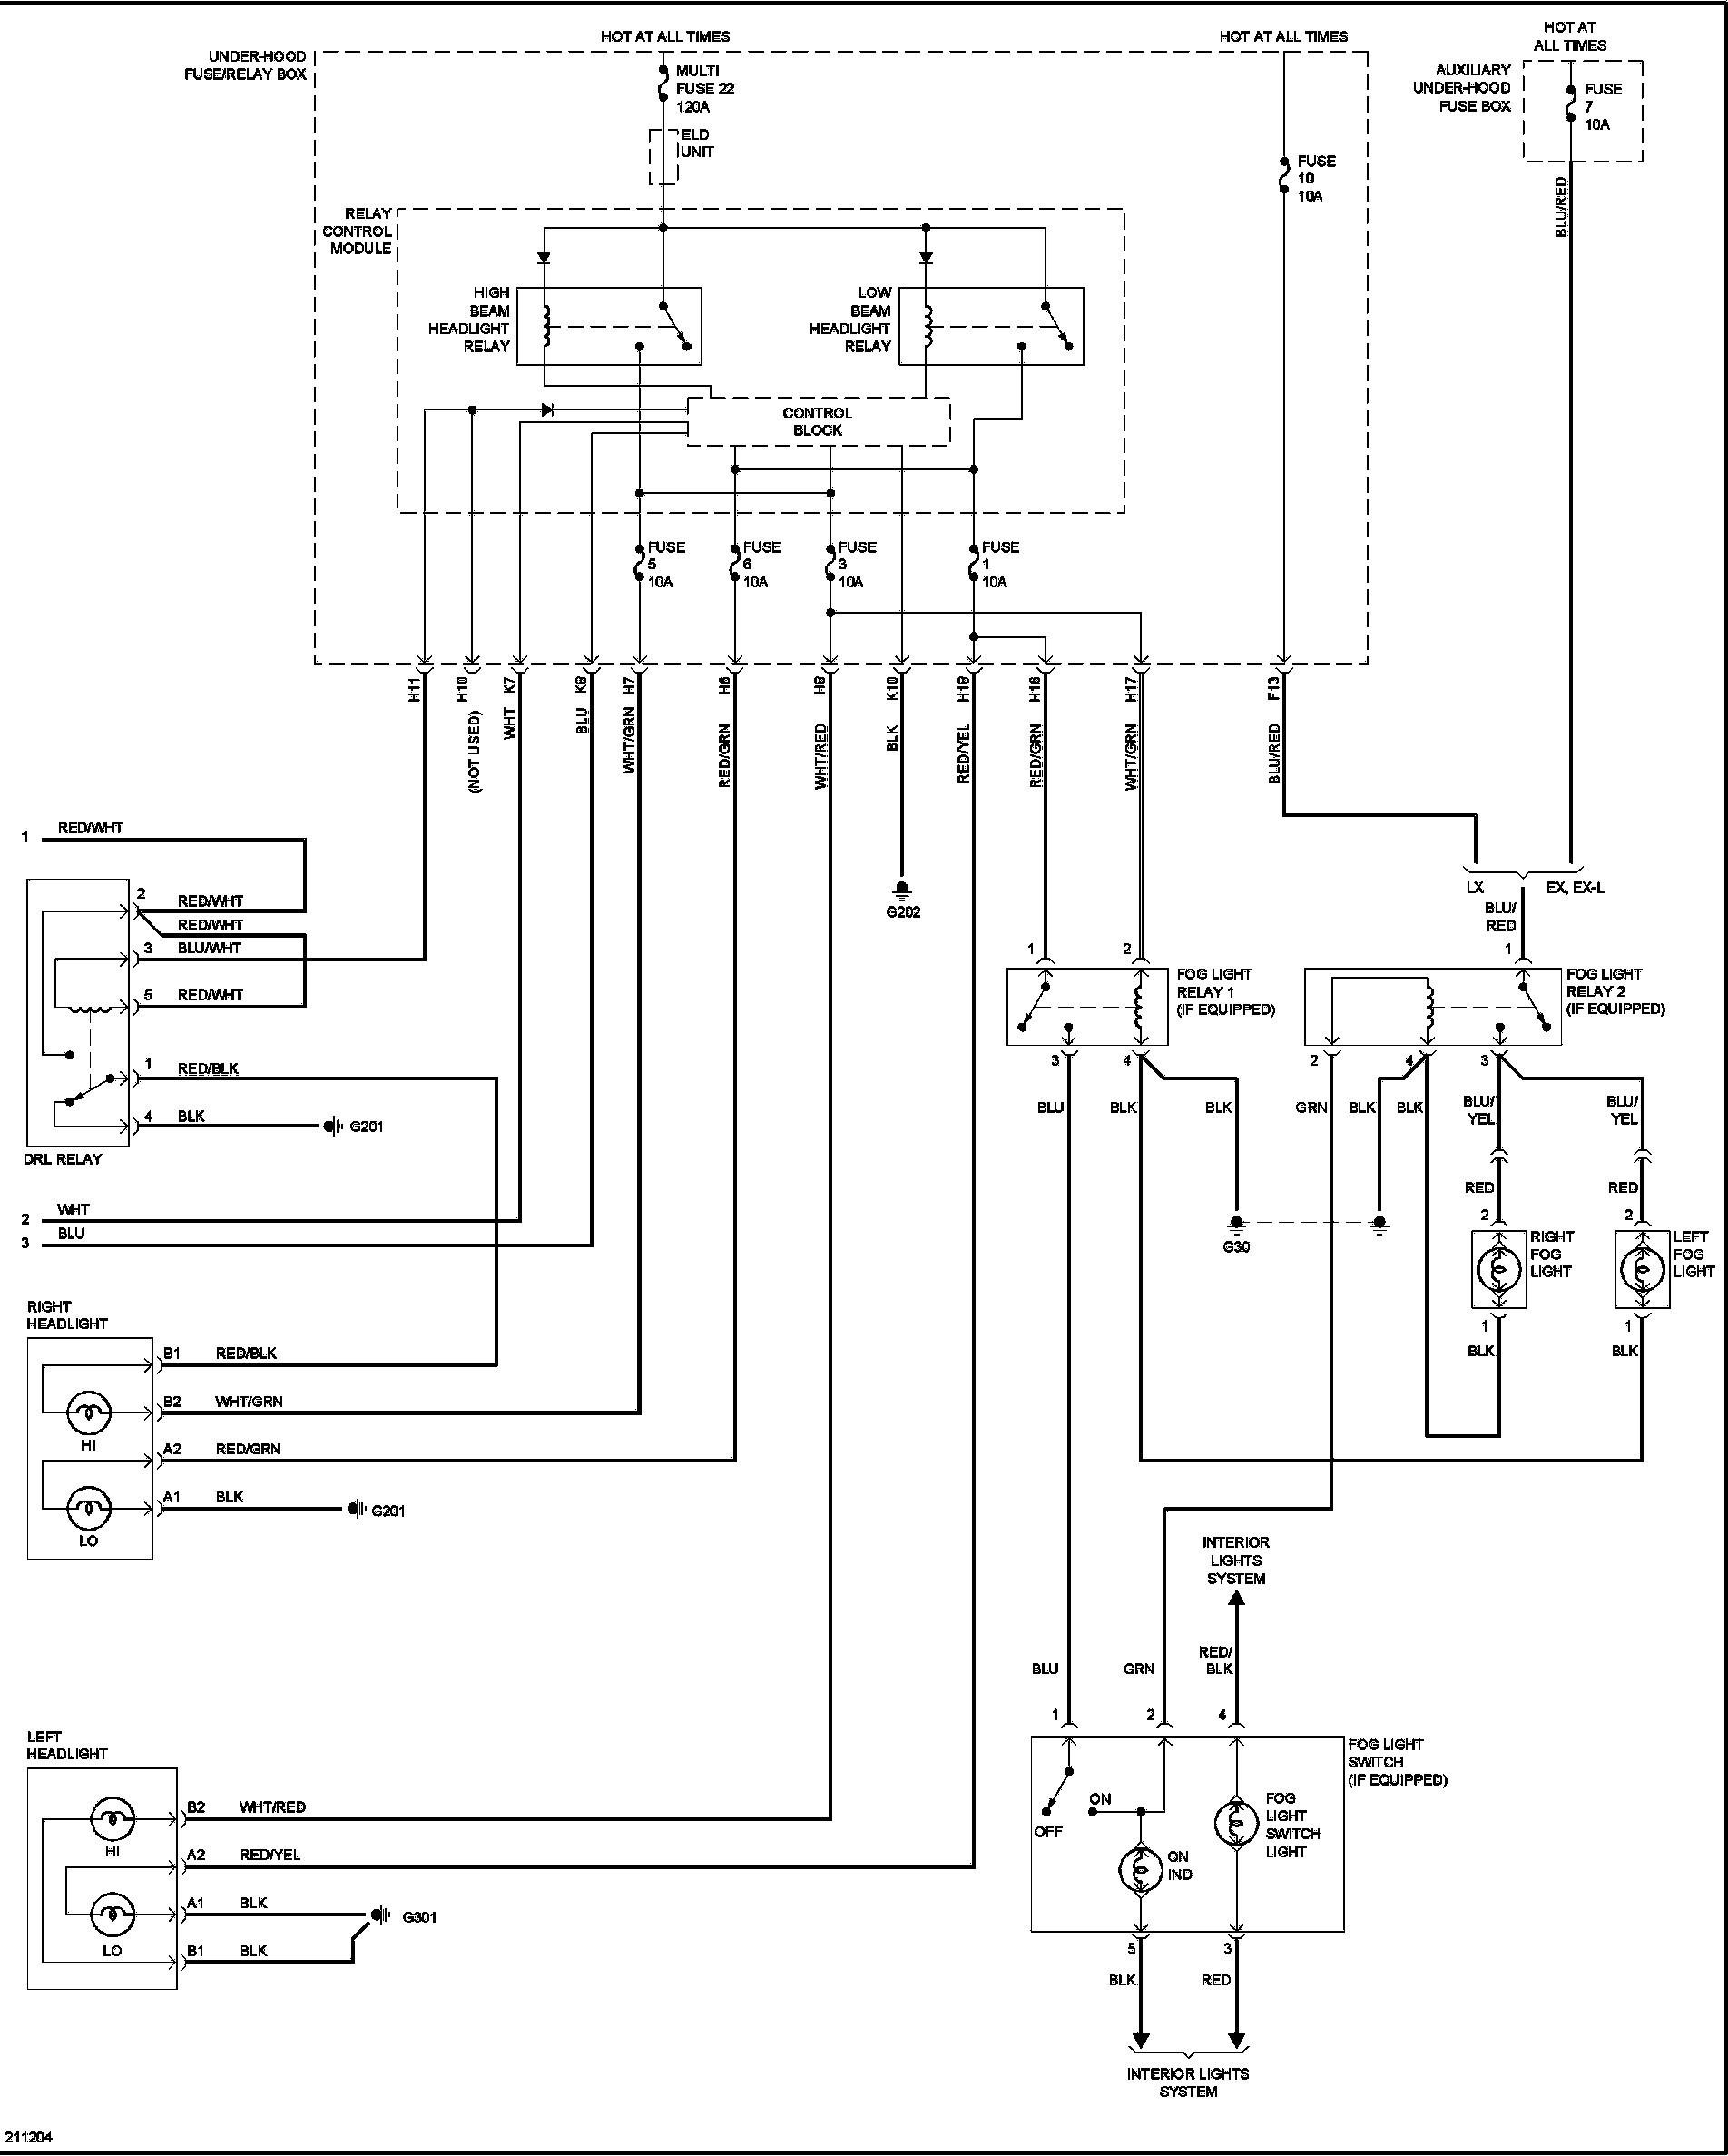 2000 Honda Civic Wiring Harness - M7 Wiring Diagram on